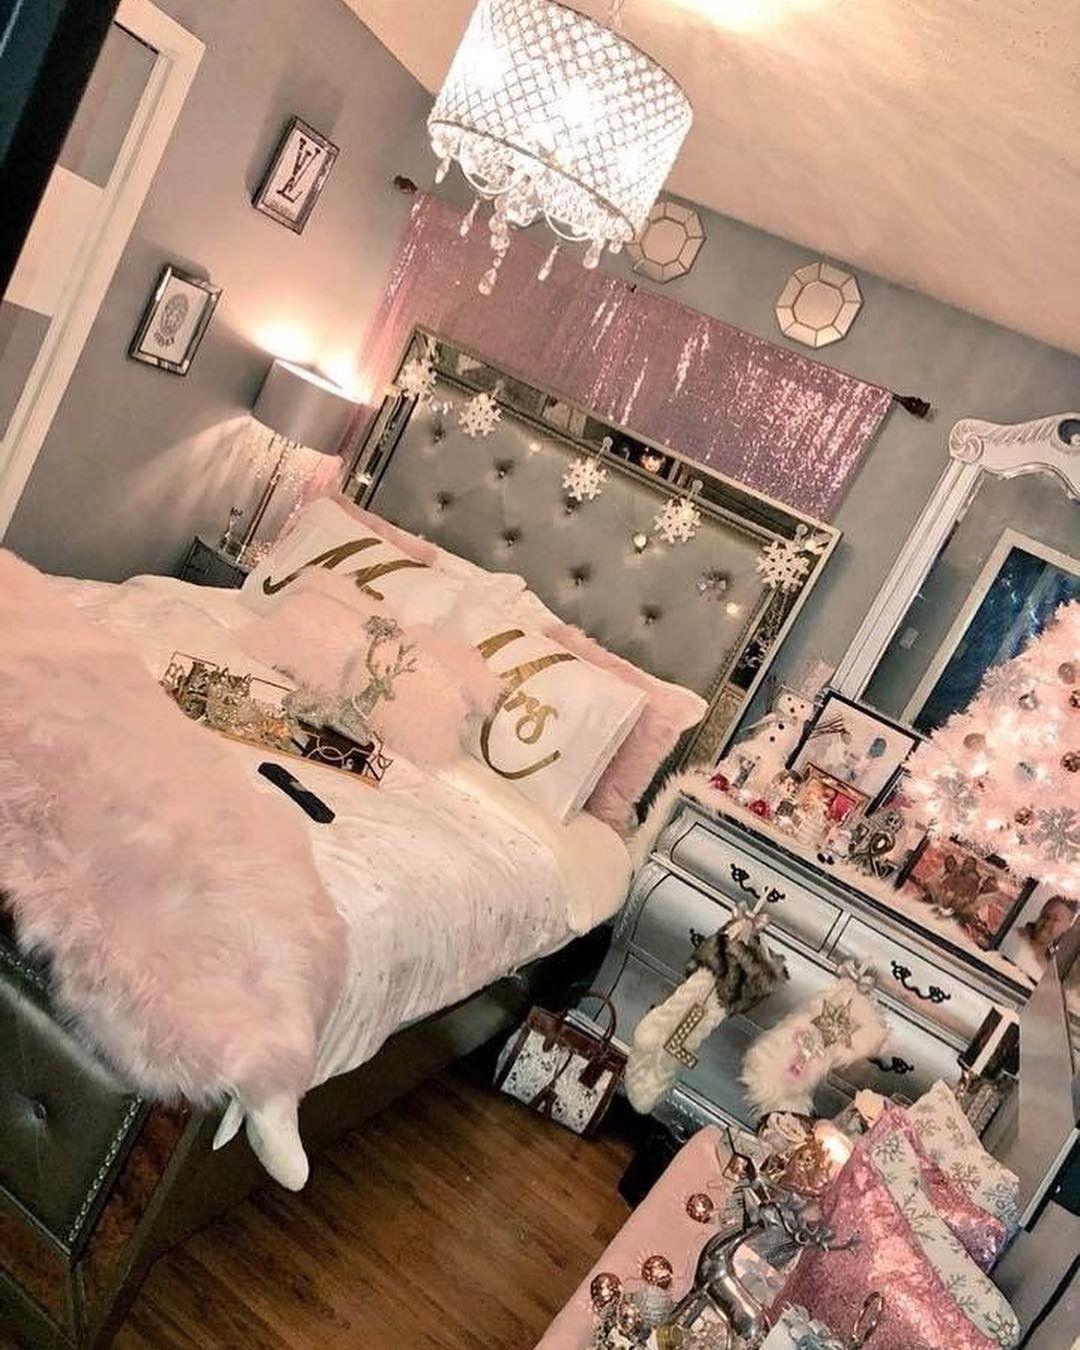 Pinterest Girly Girl Add Me For More Cute Bedroom Ideas Girl Bedroom Decor Bedroom Decor